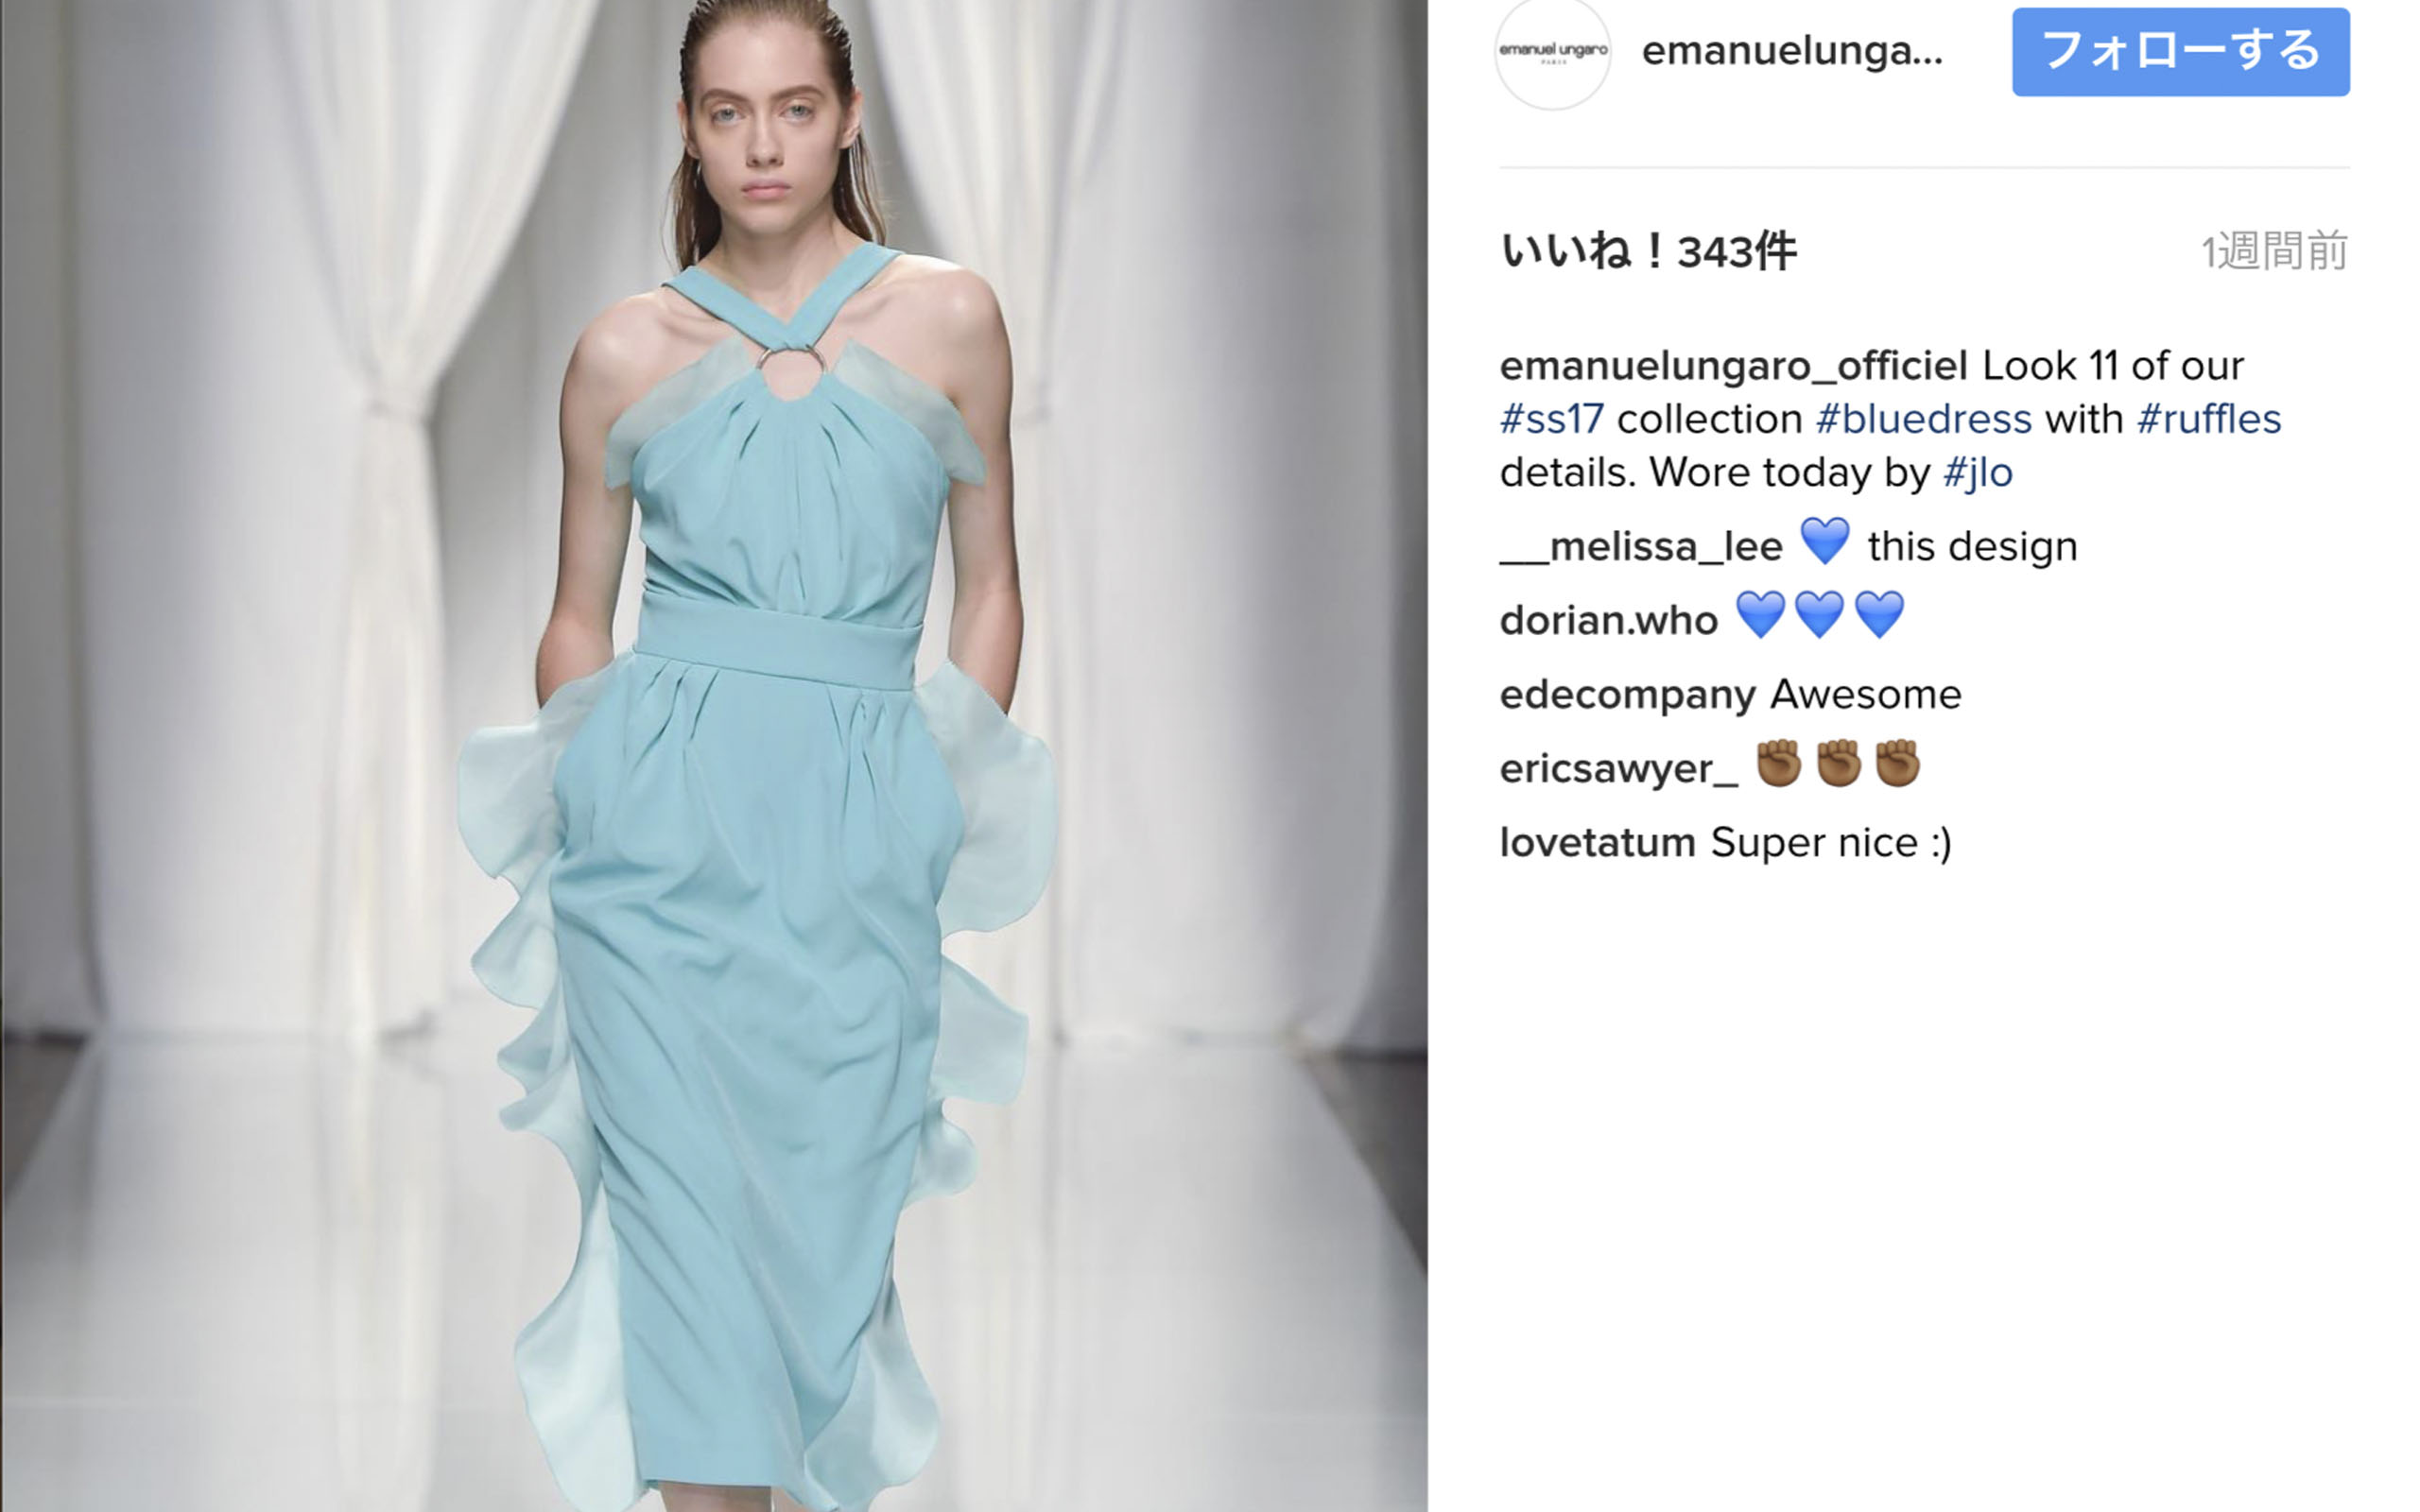 Emanuel Ungaro Names New Creative Director. Again. (Sigh)